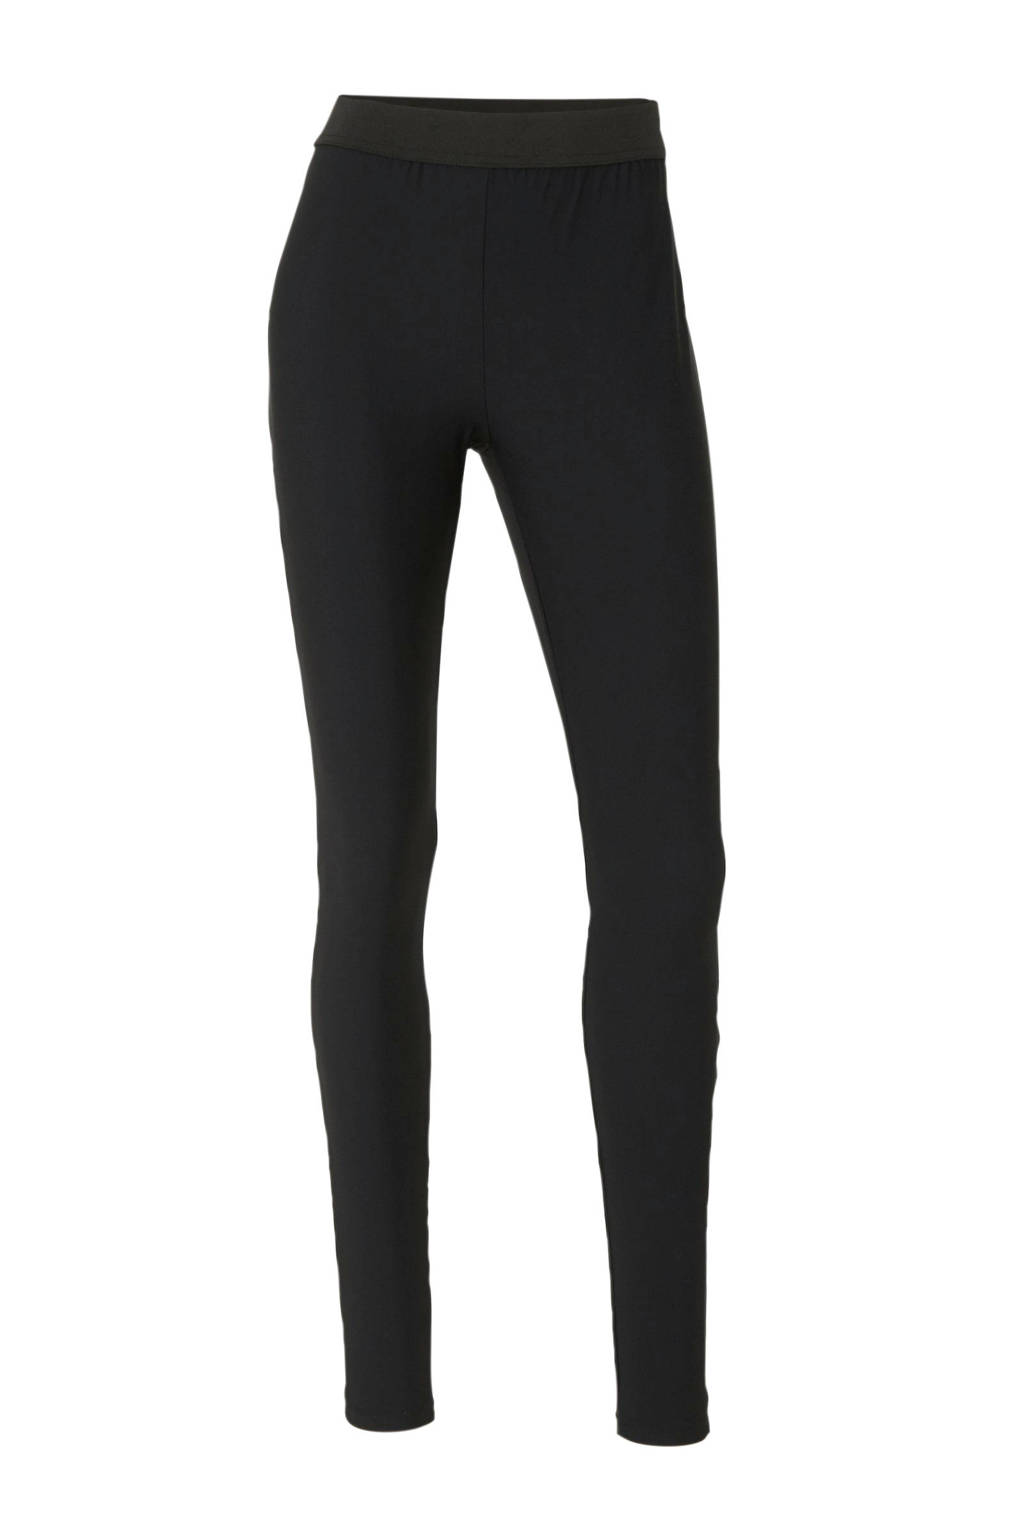 anytime legging in travel kwaliteit zwart, Zwart